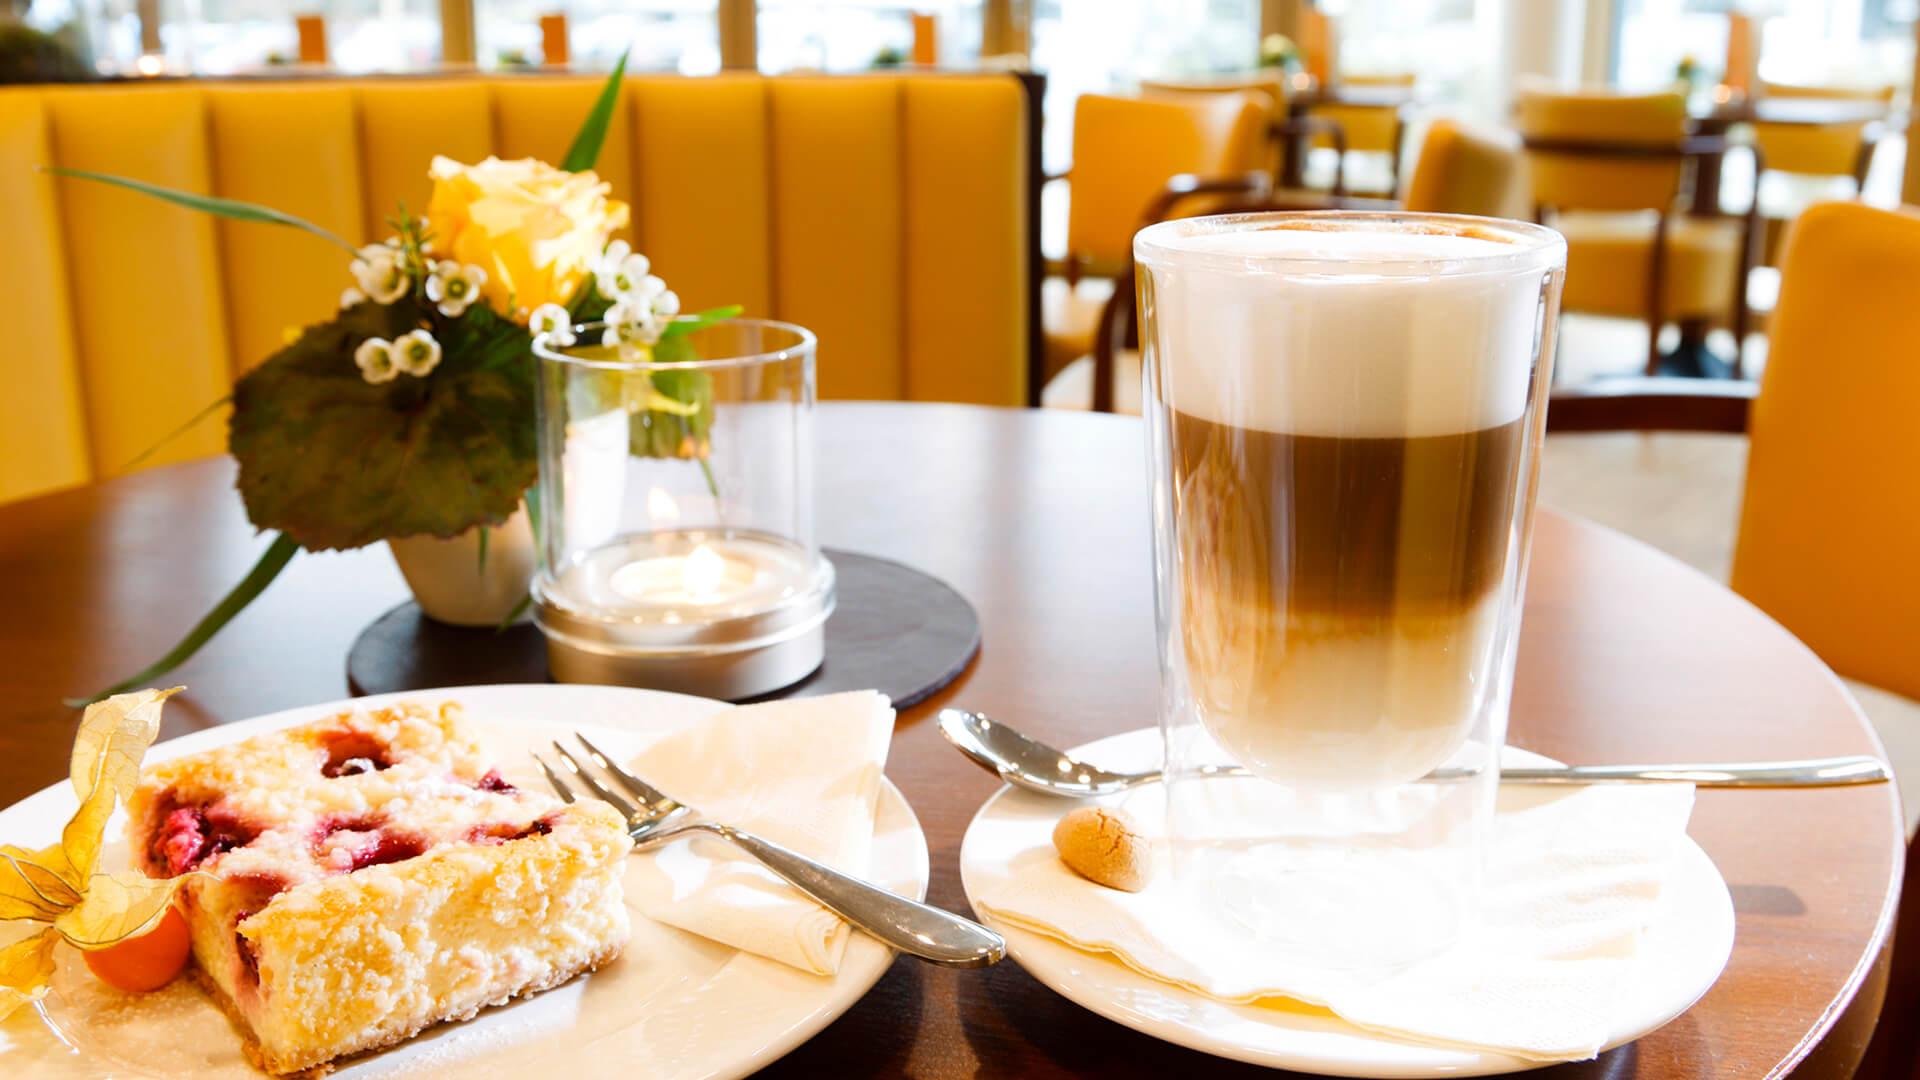 Cafe Lahnberge